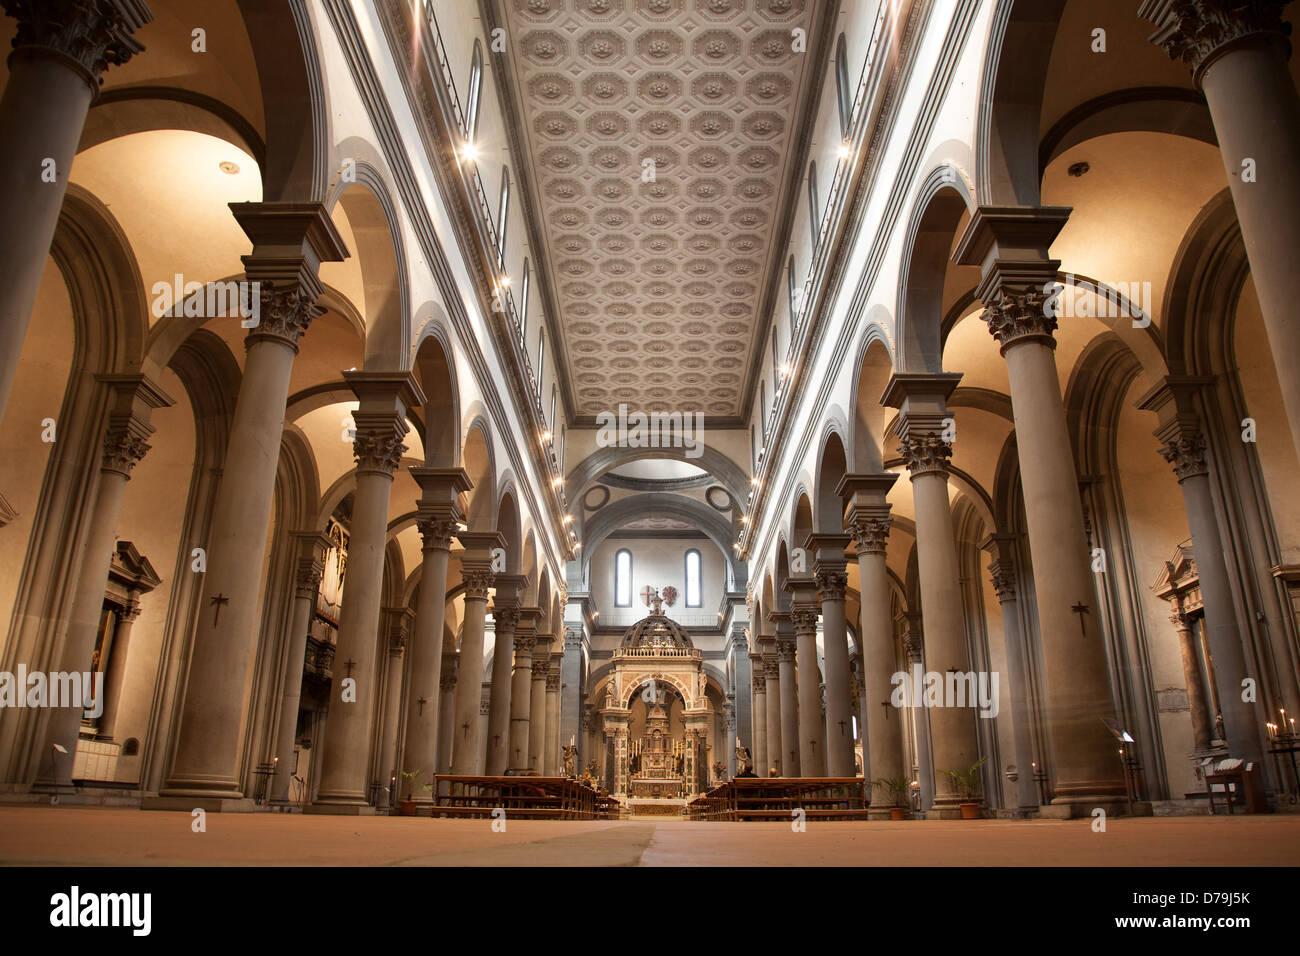 Nave of Santo Spirito Church, Florence, Italy - Stock Image